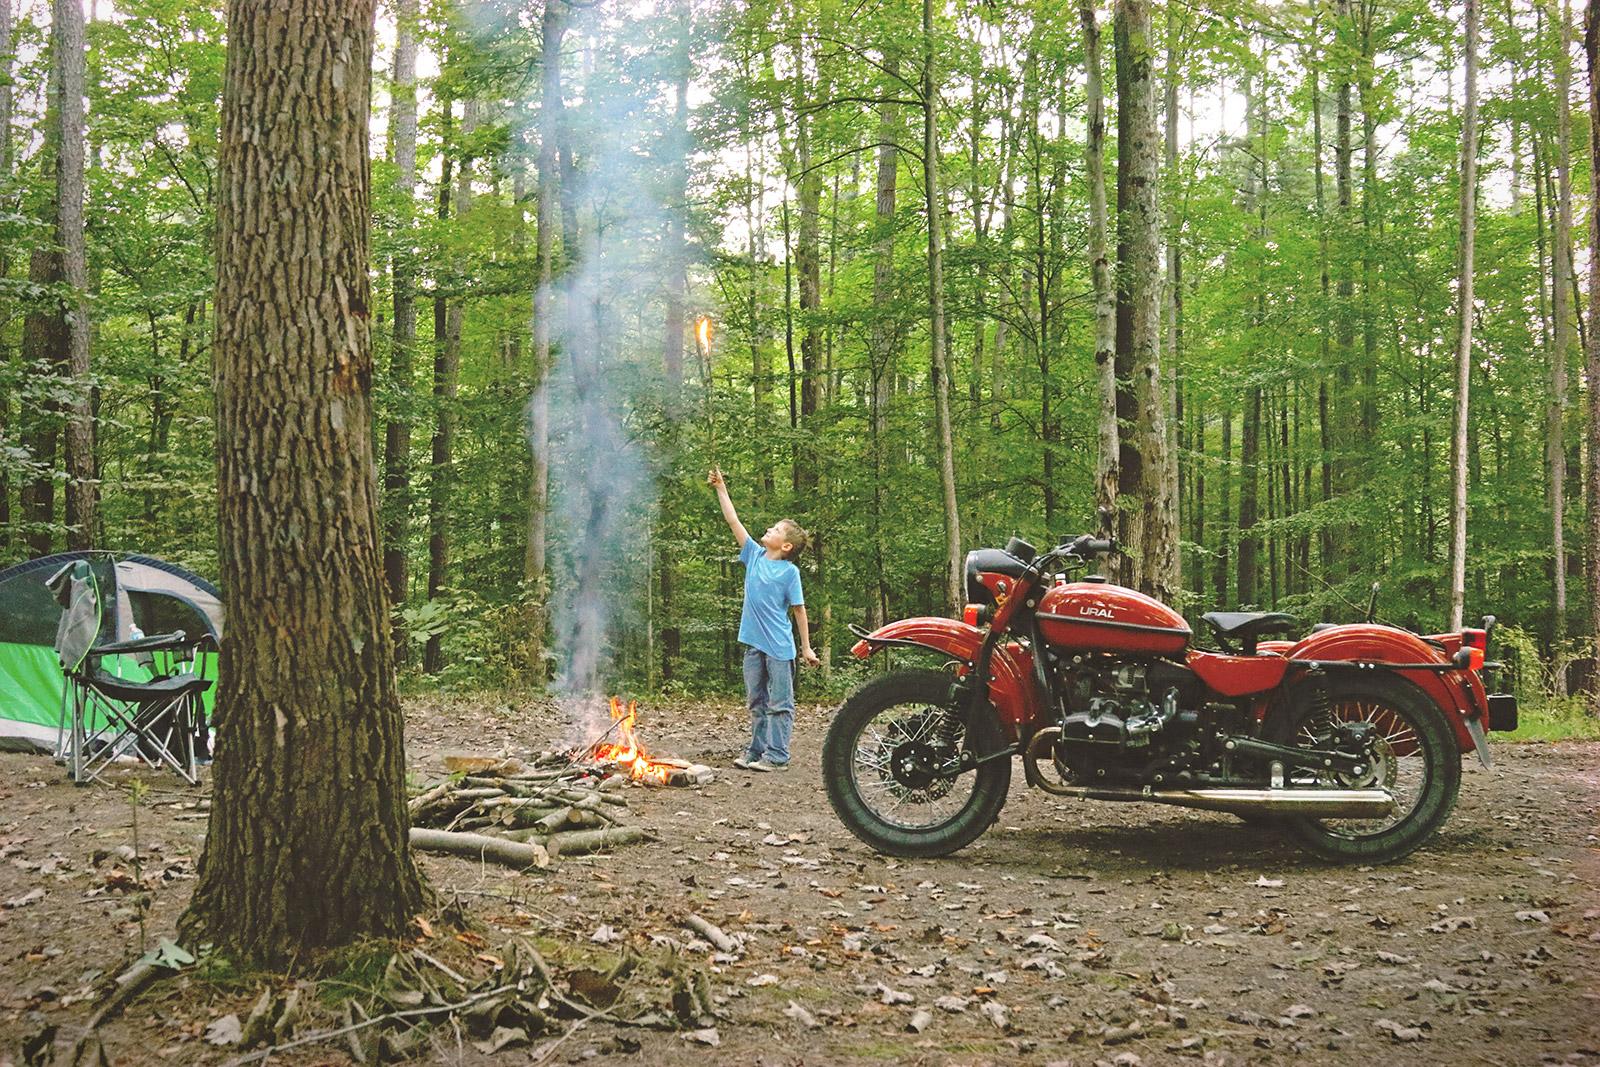 Ural Motorcycles cT camping goodsparkgarage